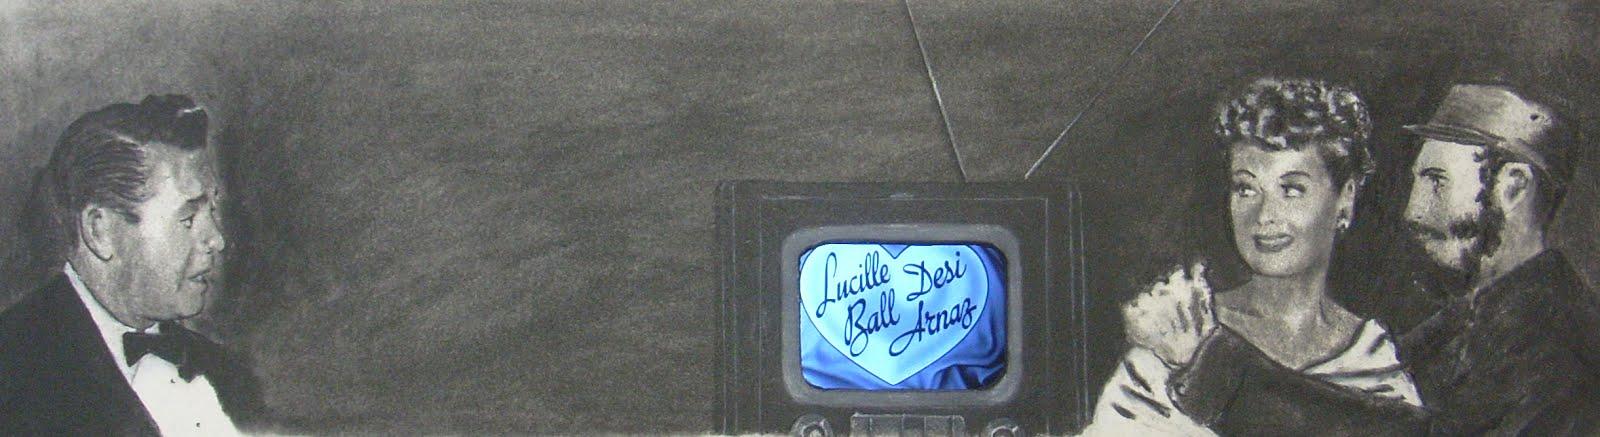 Lucy Ball, Desi Arnaz, Fidel Castro